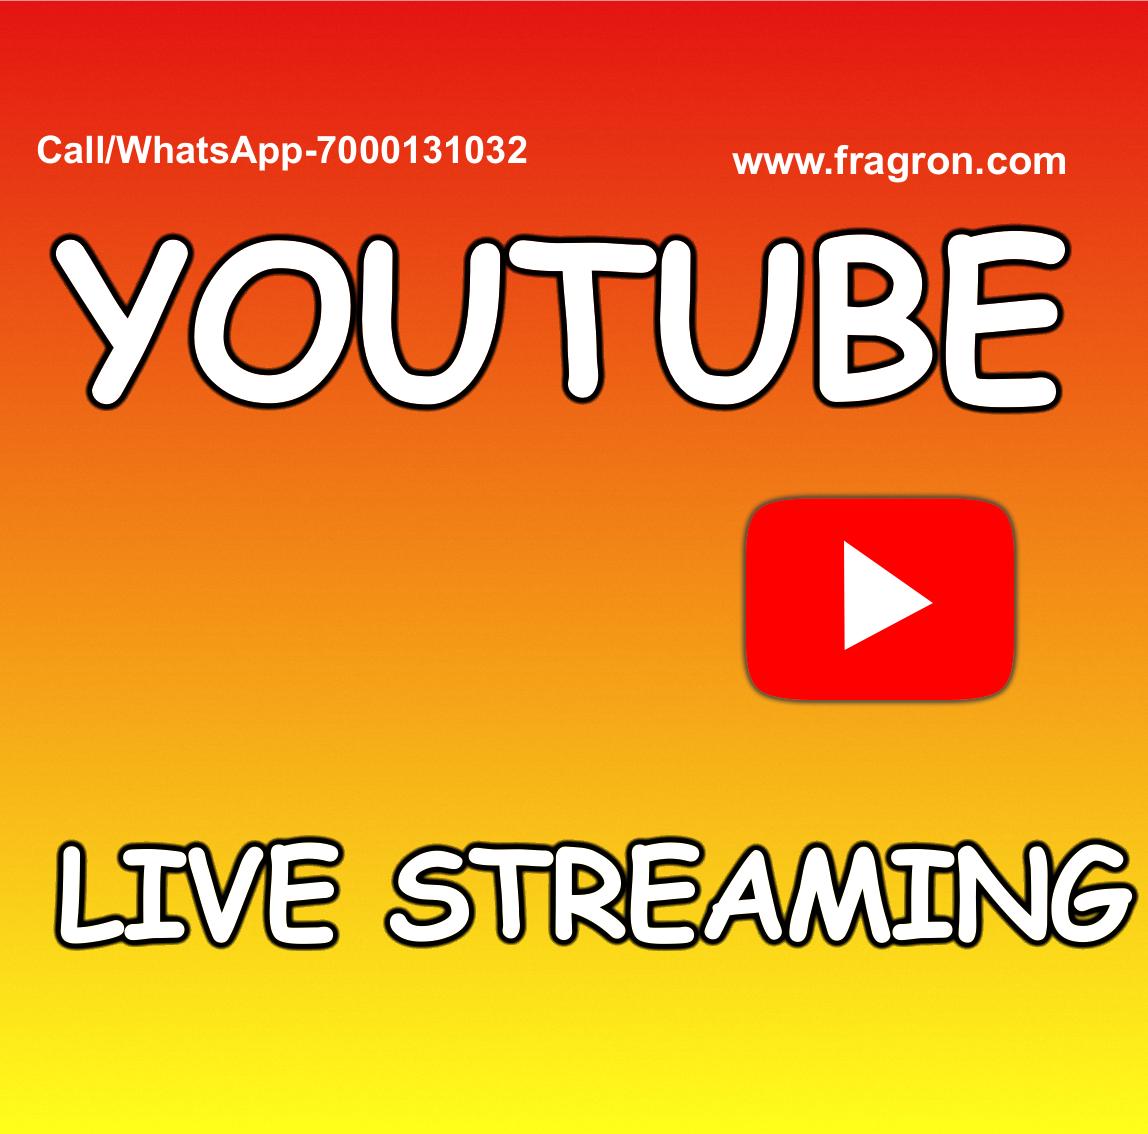 यूट्यूब पर लाइव ब्रॉडकास्ट